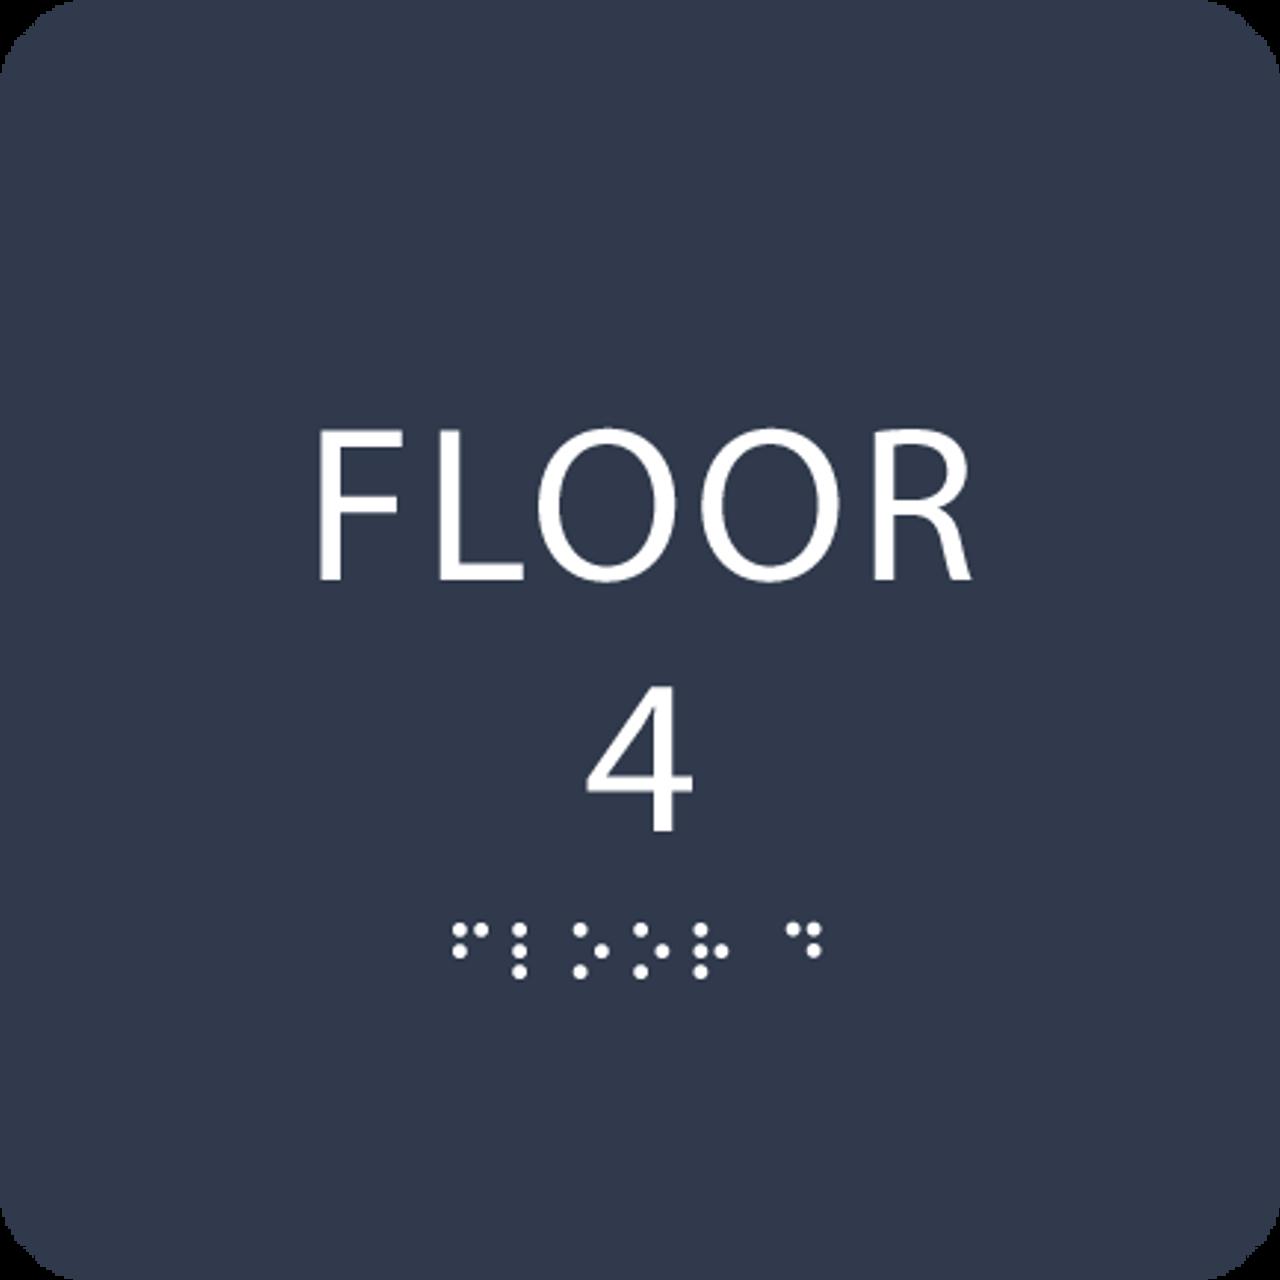 Navy Floor 4 Identification Sign